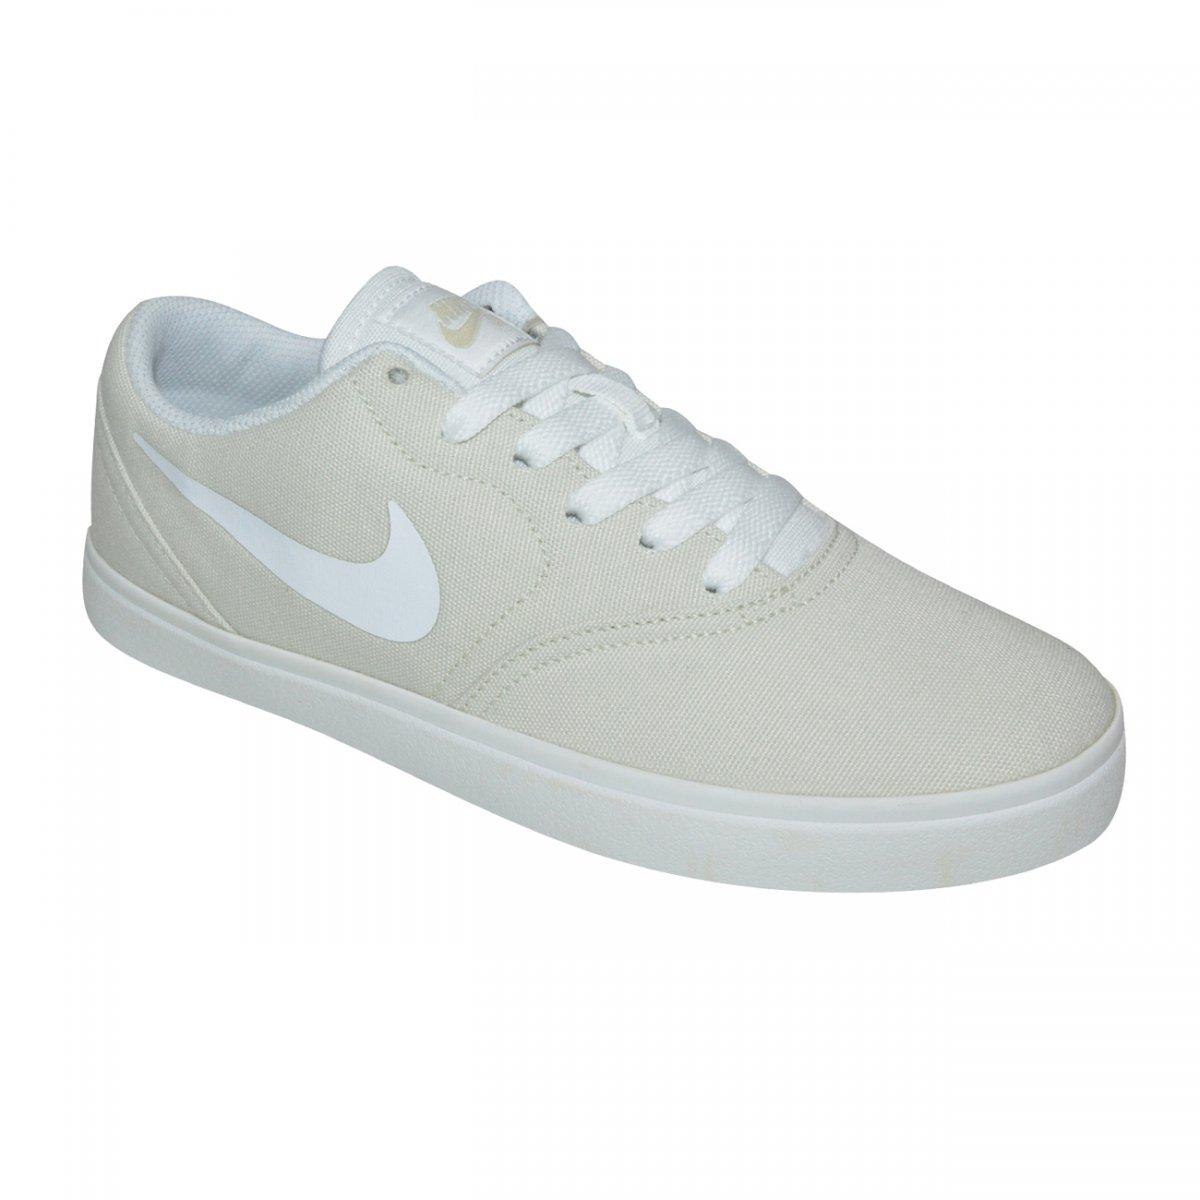 50b00ef48bc Tenis Nike SB Check CNVS Juvenil 905373 002 - Areia Branco - Chuteira Nike